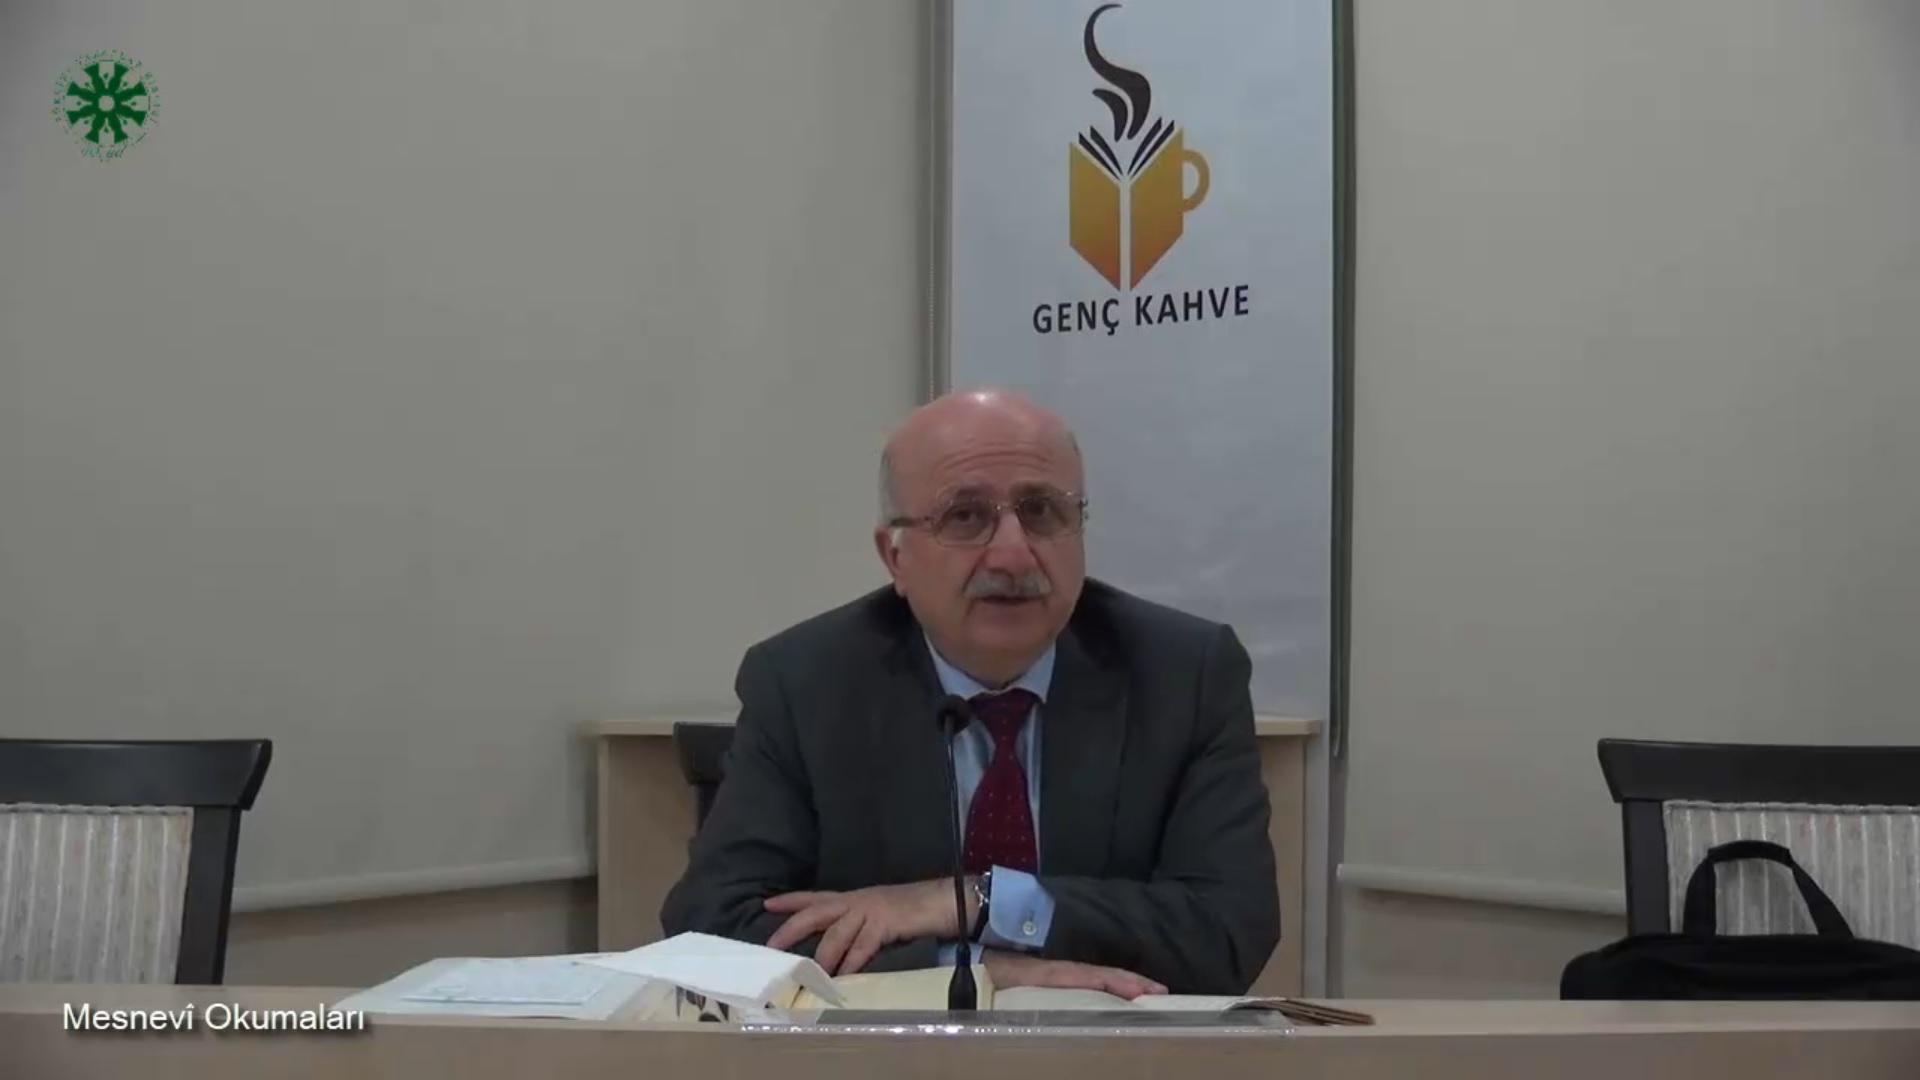 Mesnevî Okumaları -28- Prof. Dr. Adnan Karaismailoğlu (video)